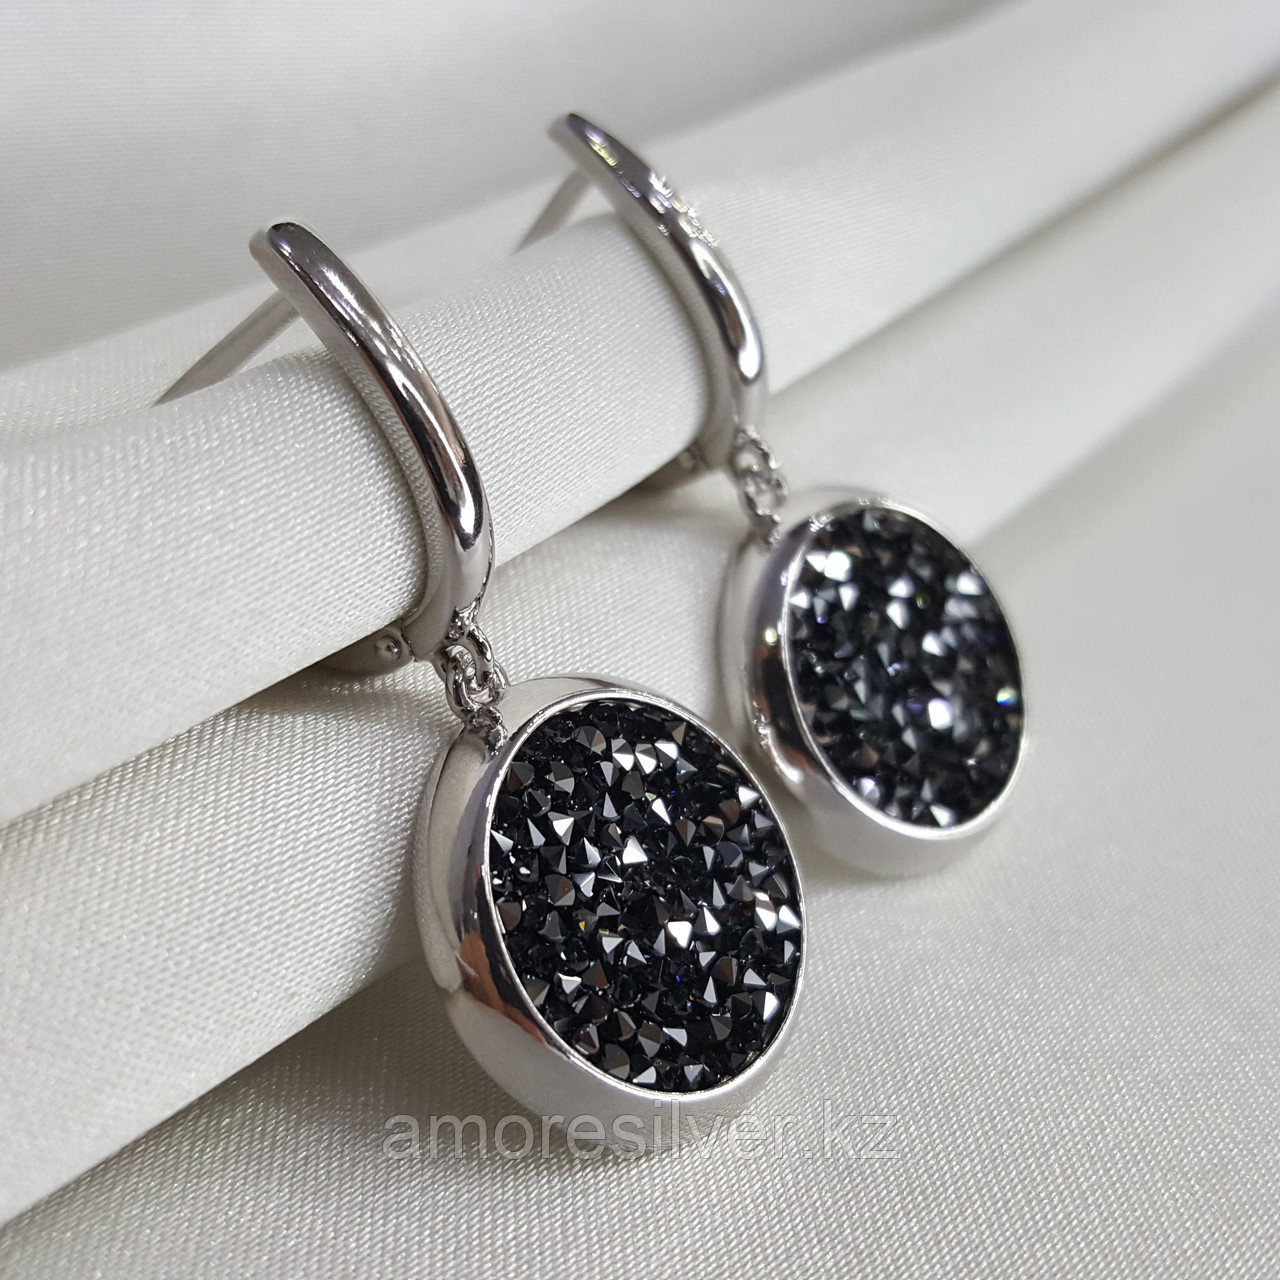 Серьги SOKOLOV серебро с родием, кристалл swarovski fine rocks , многокаменка 94022683 - фото 8